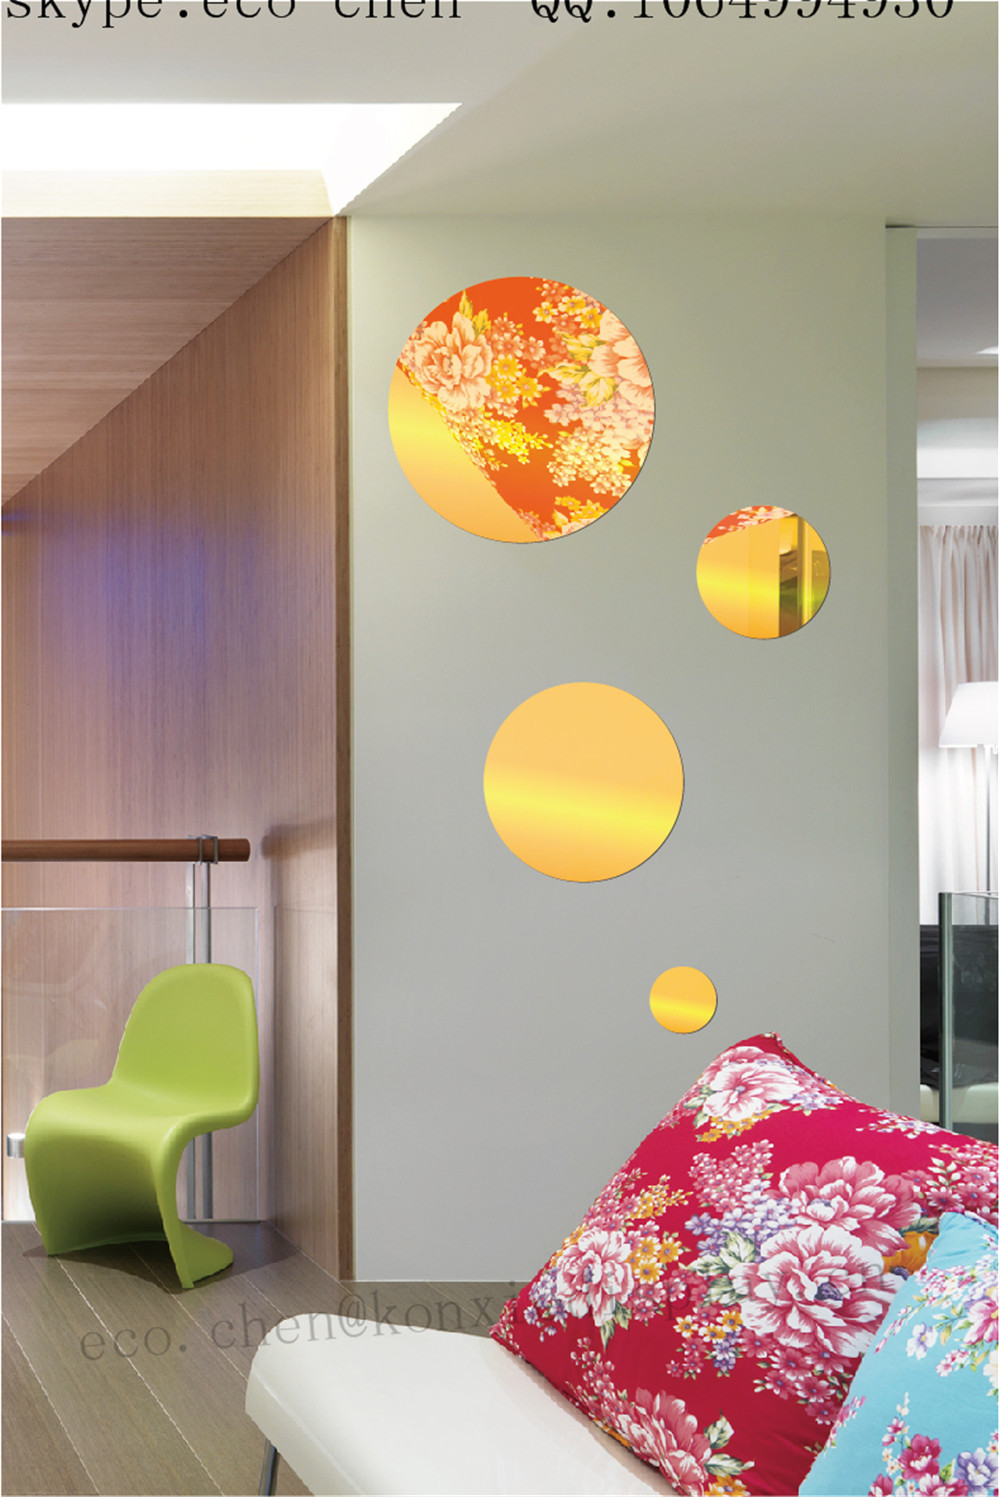 Acryl kreise dekoration wand h ngen andere h usliche dekoration produkt id 60324568898 german - Ubergang wand decke acryl ...